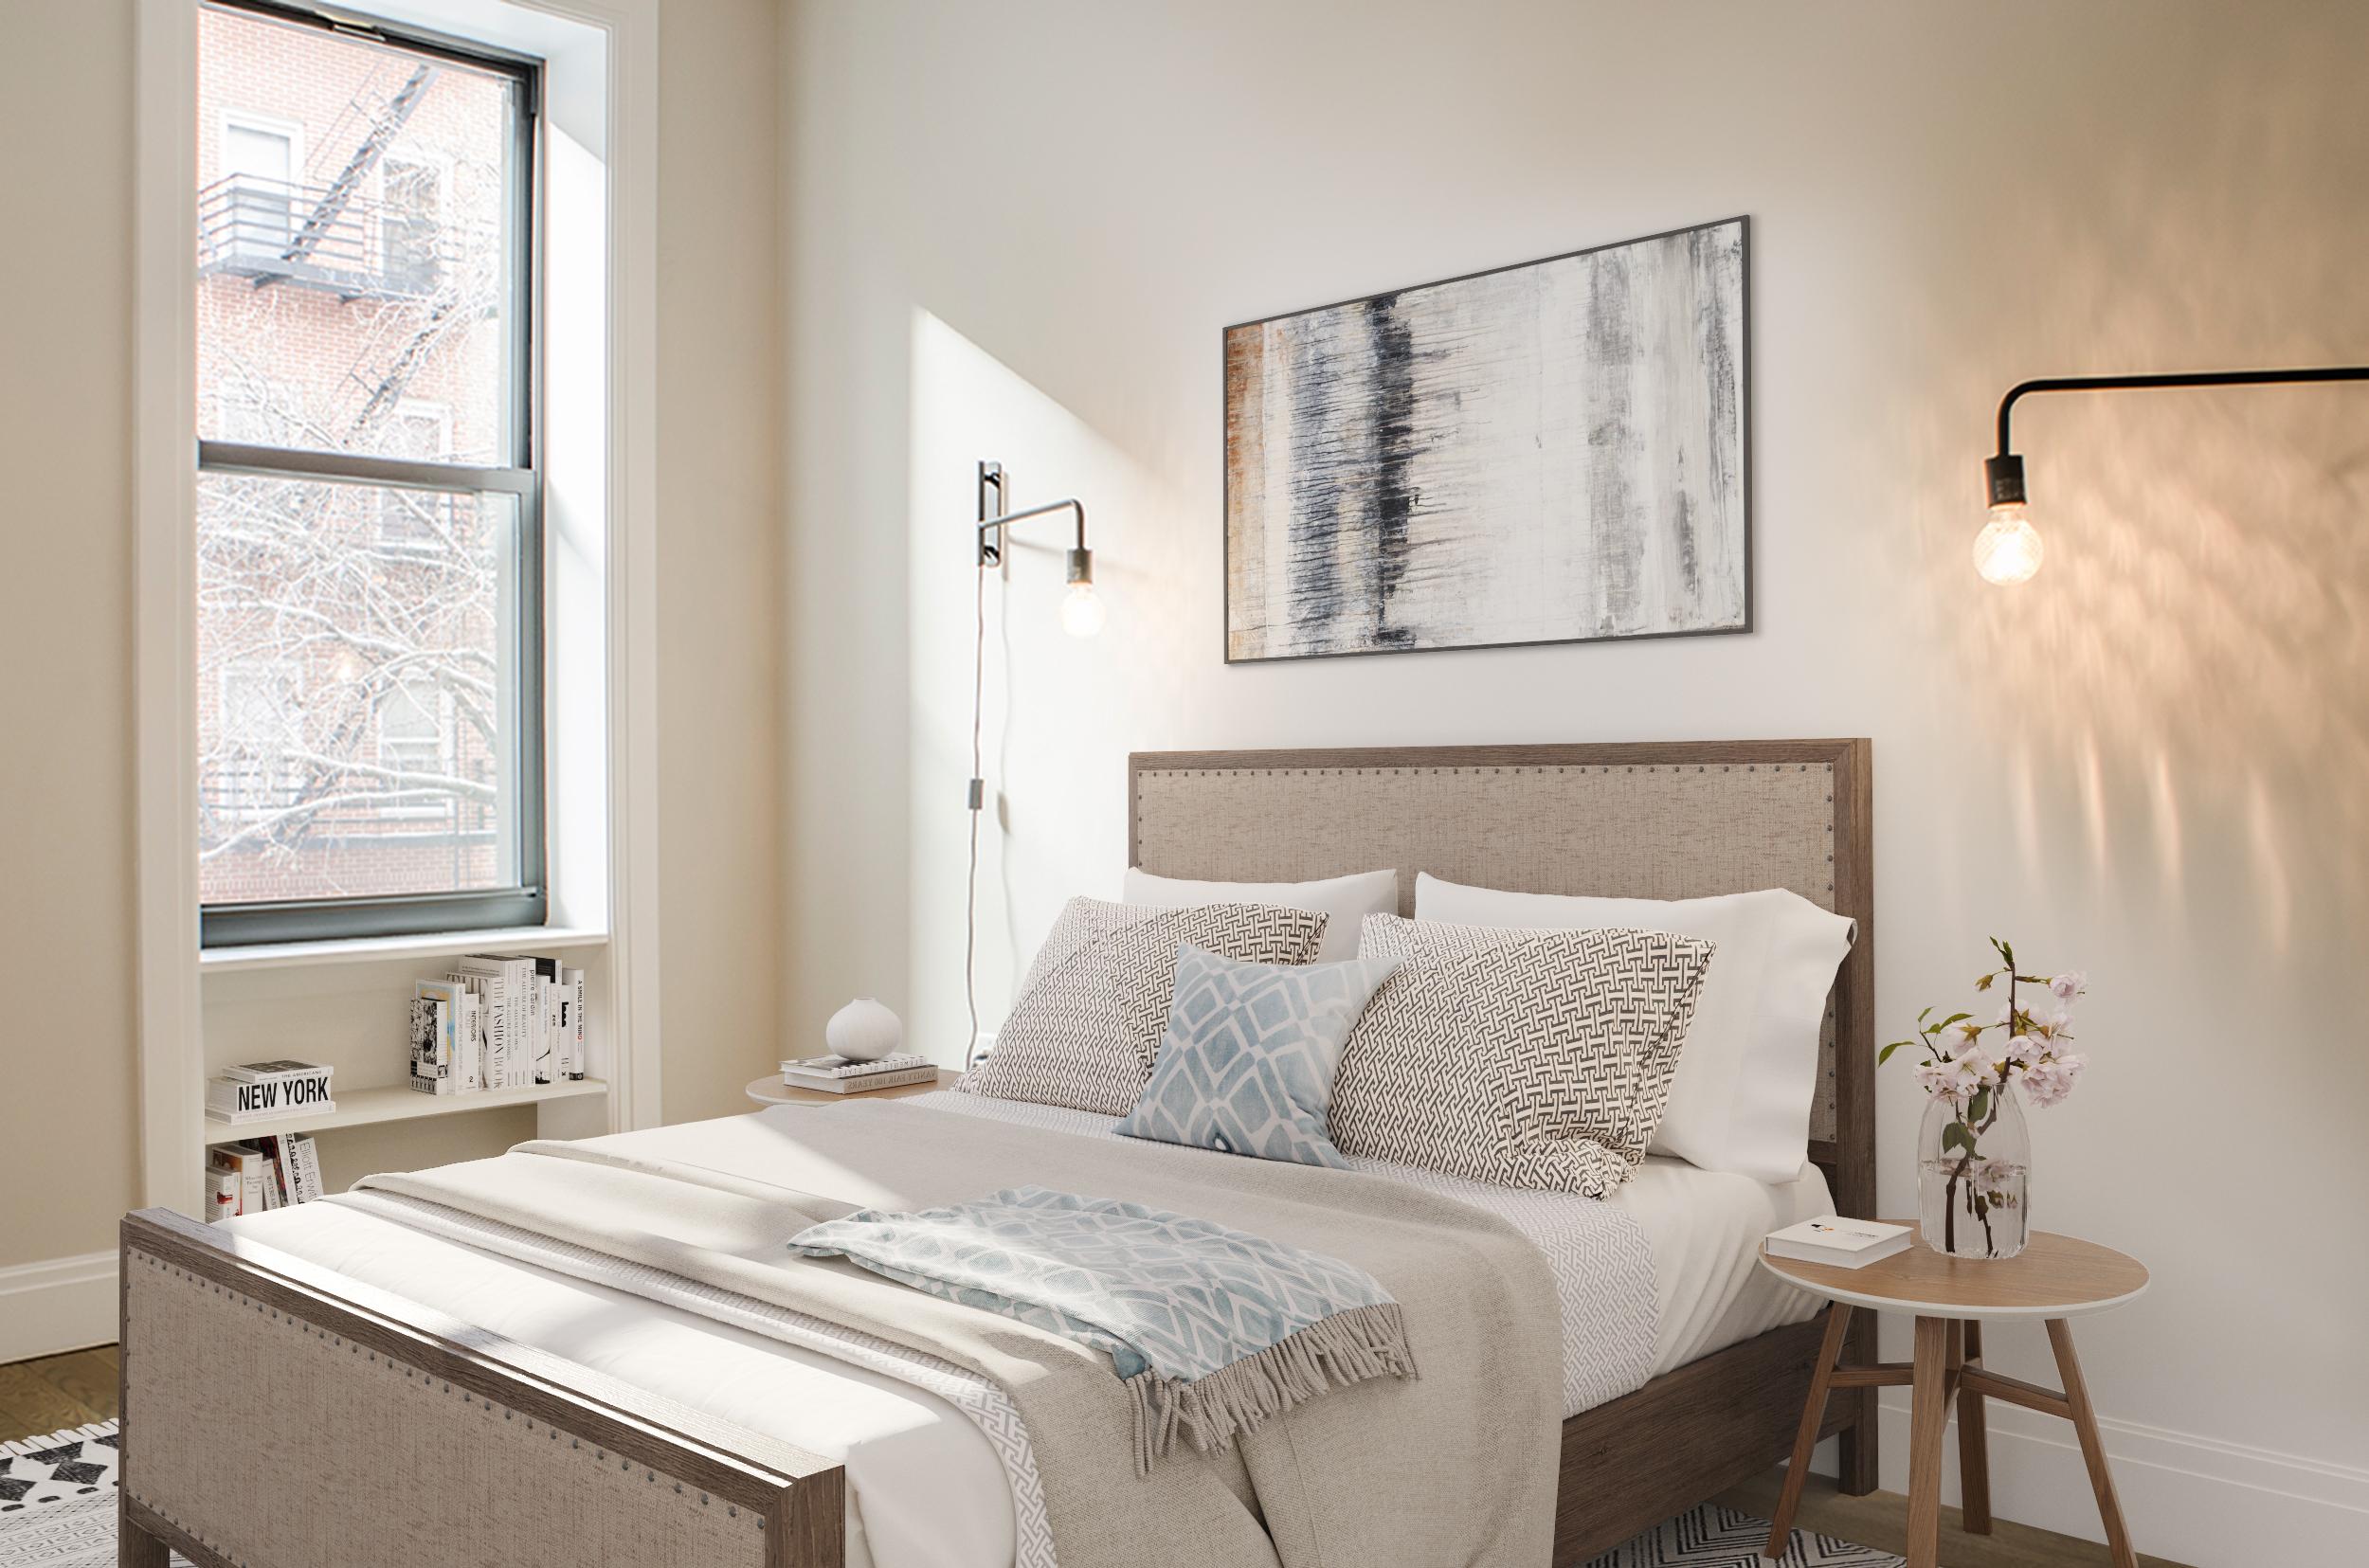 Brandon T_333 East 83rd Str_Third Bedroom_staged_BS.jpg